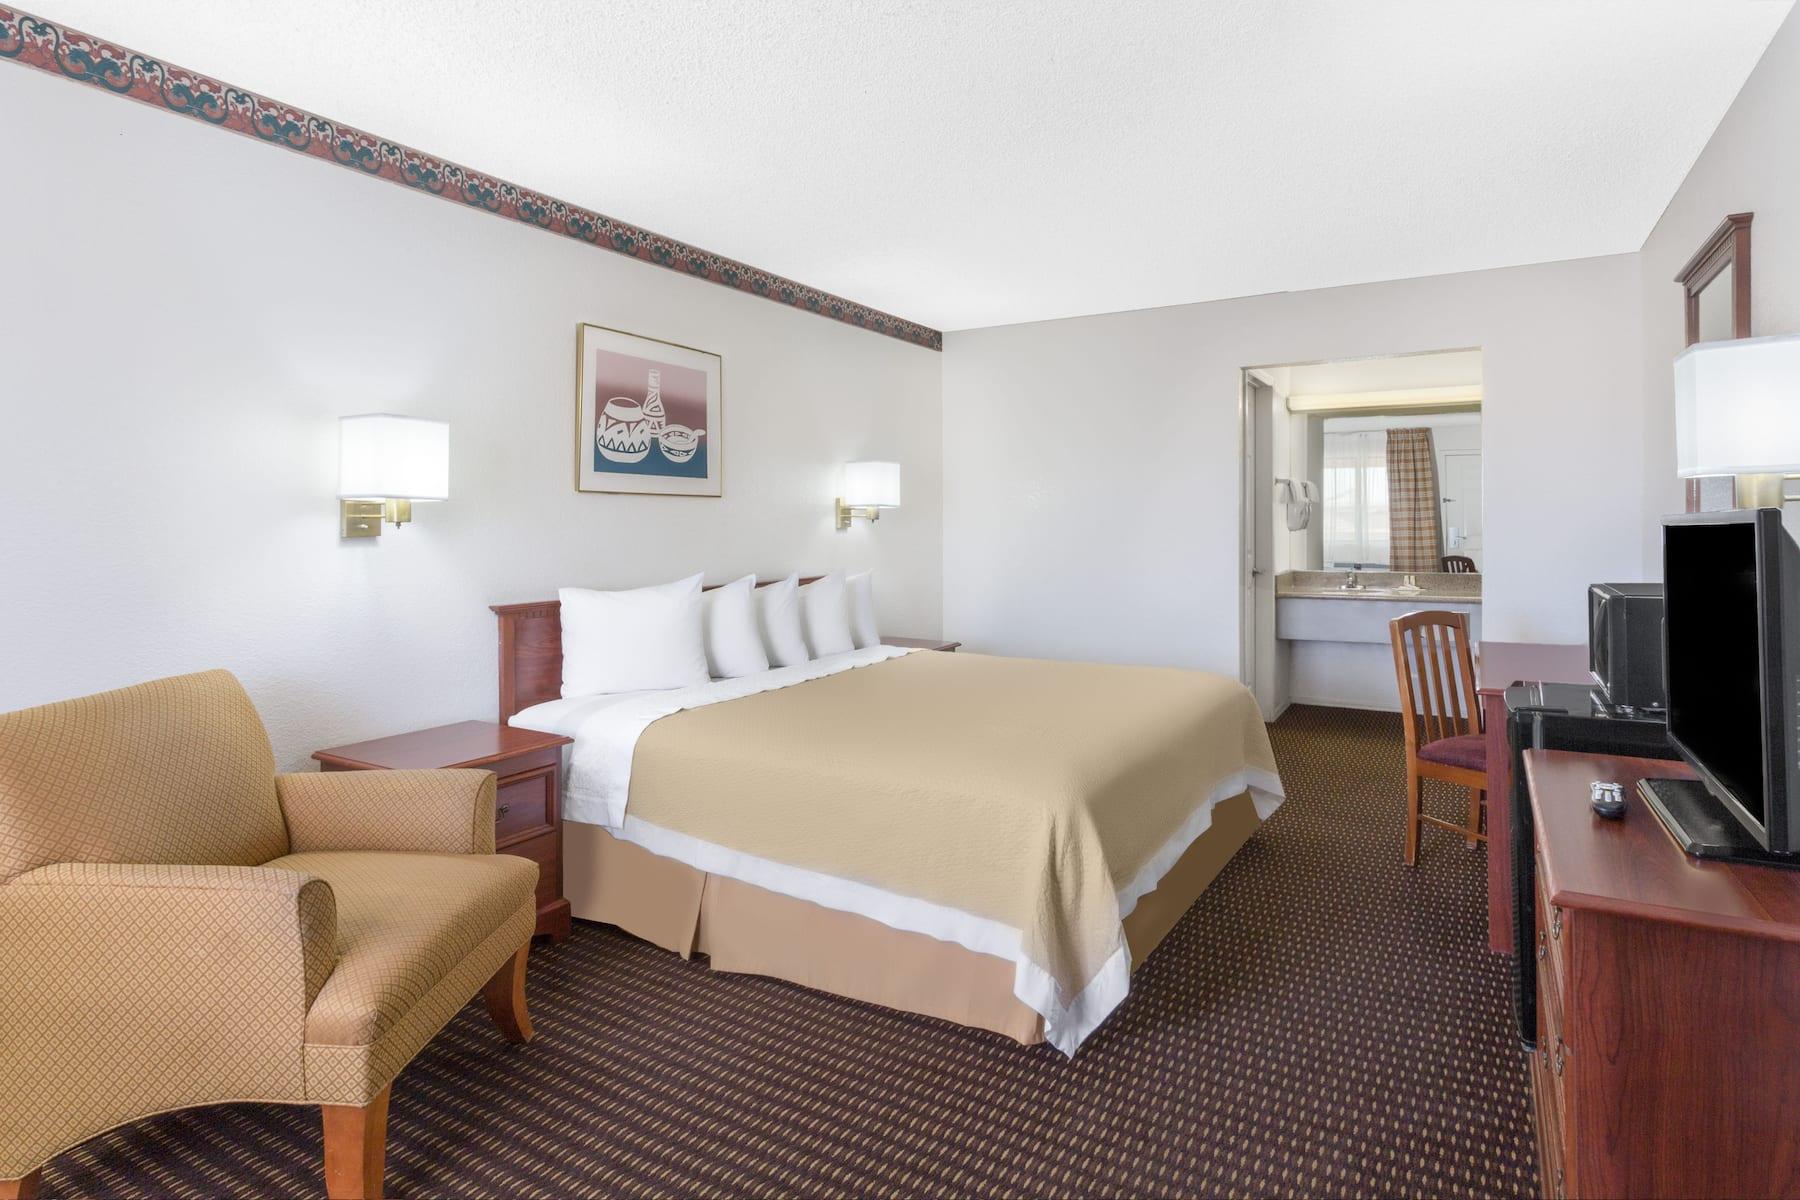 Days Inn By Wyndham Kingman West Kingman Az Hotels